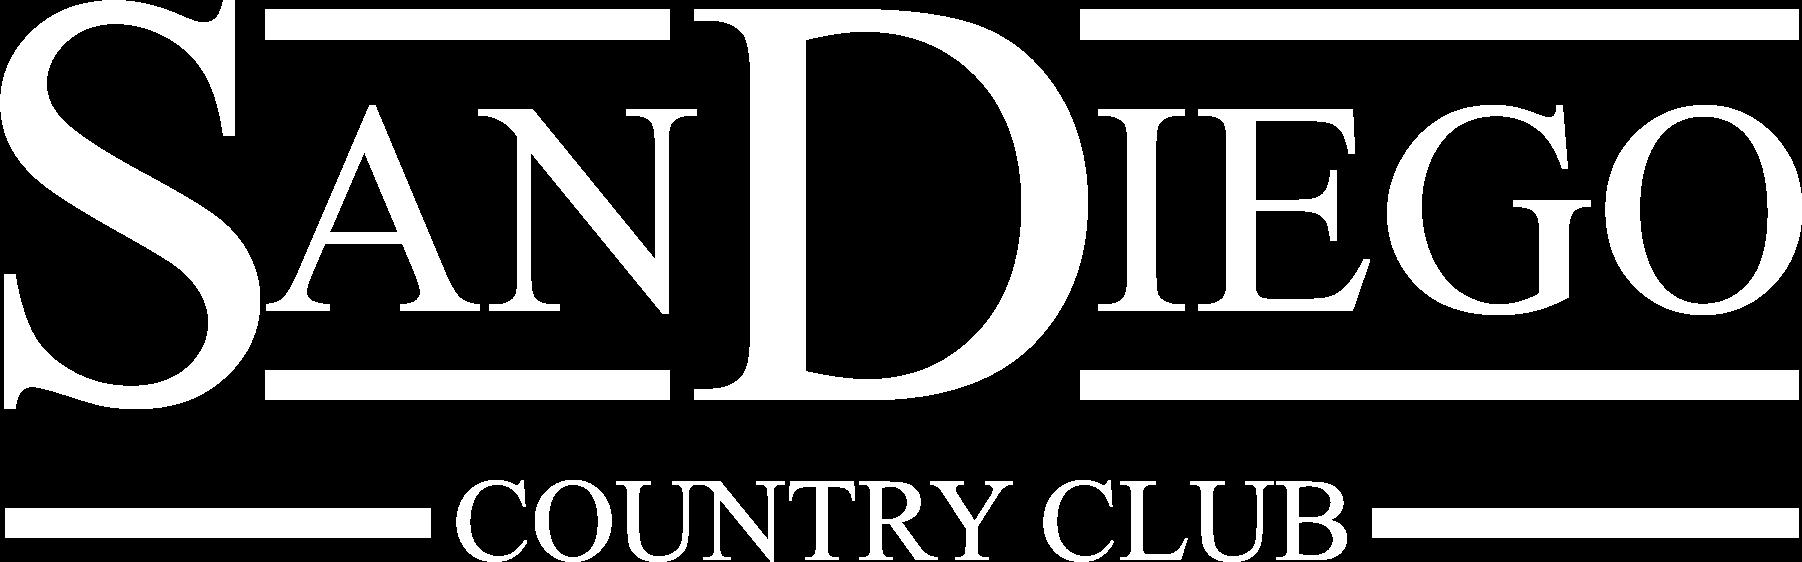 San-Diego-Country-Club-LOGO-v02-blanco-bis.png